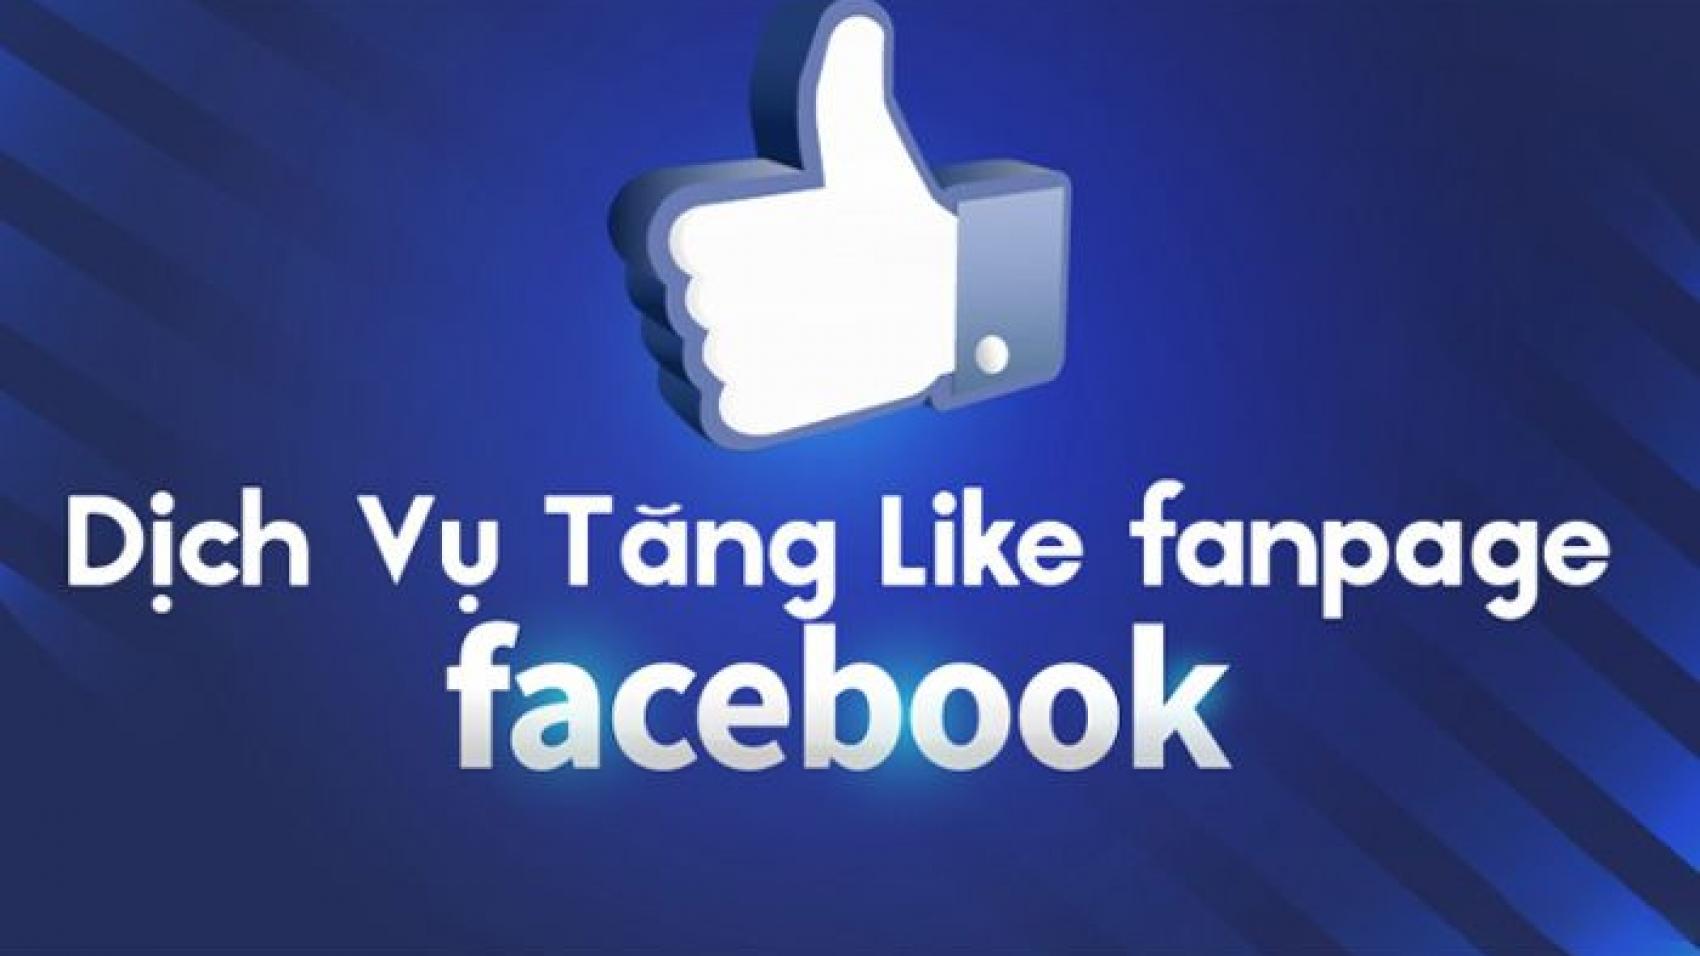 Tại Sao Cần Dịch Vụ Tăng Like Fanpage Facebook?